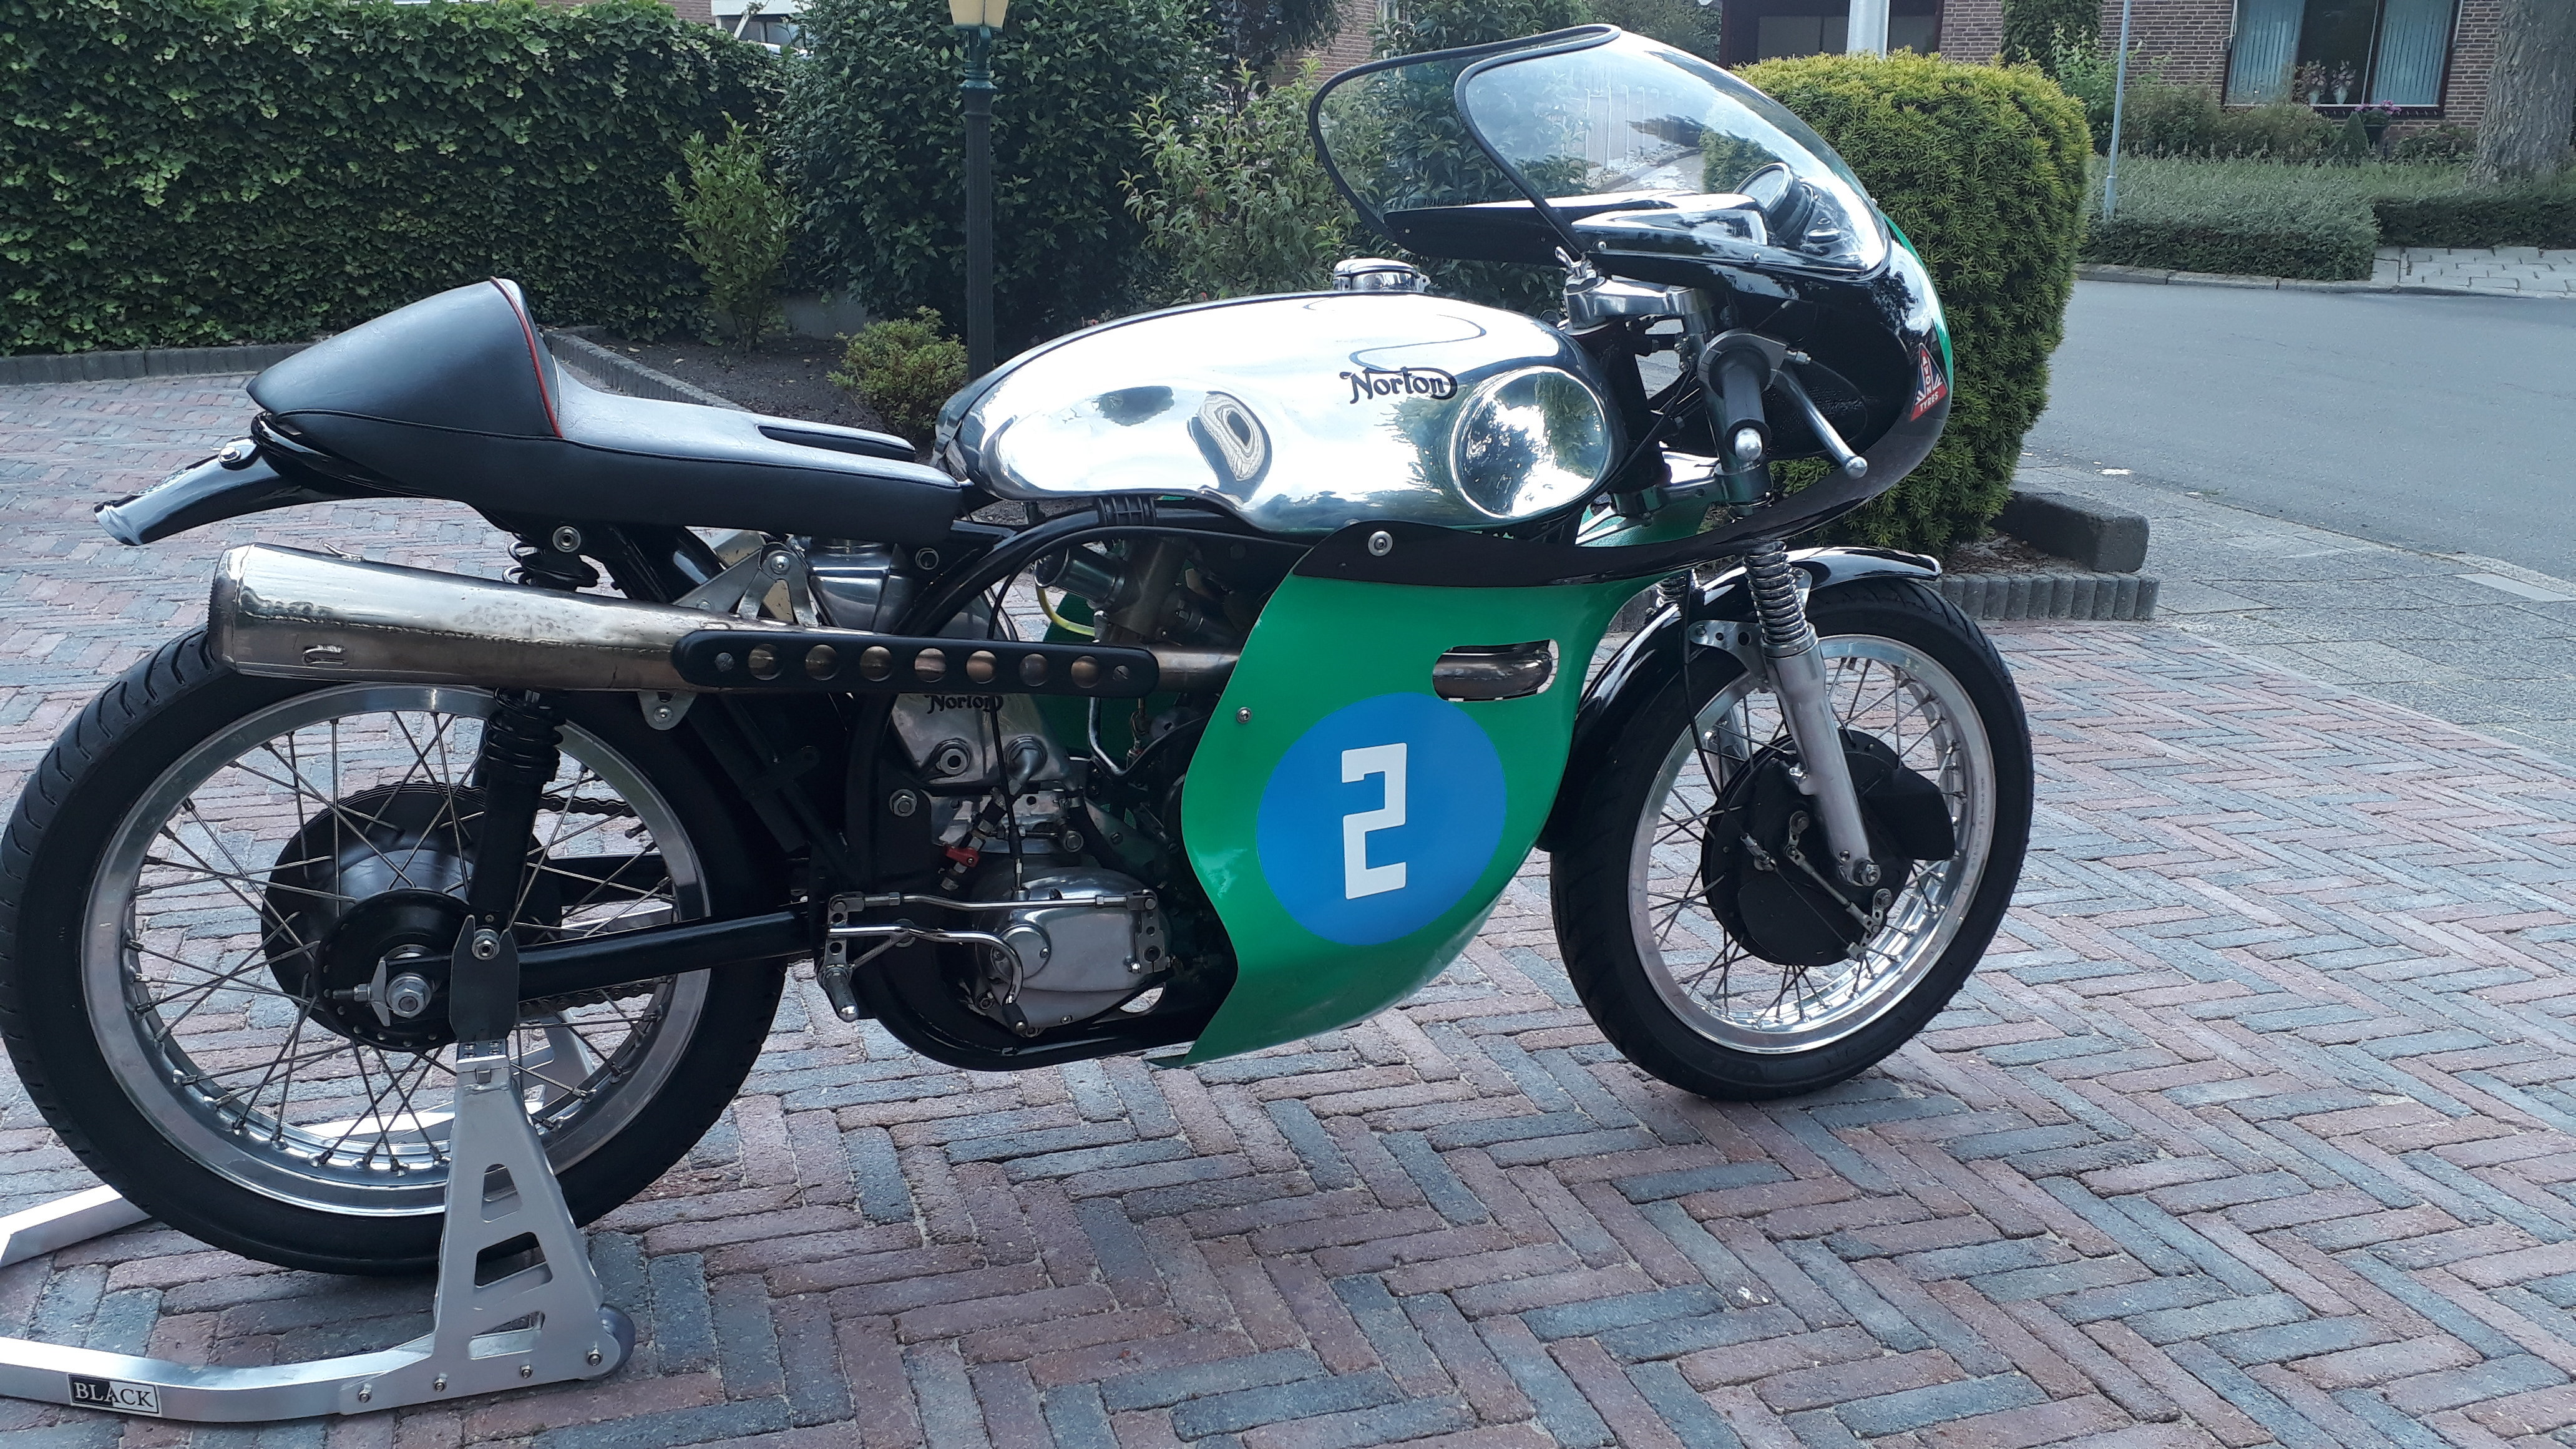 1961 Norton manx classicracer 40m. For Sale (picture 2 of 4)